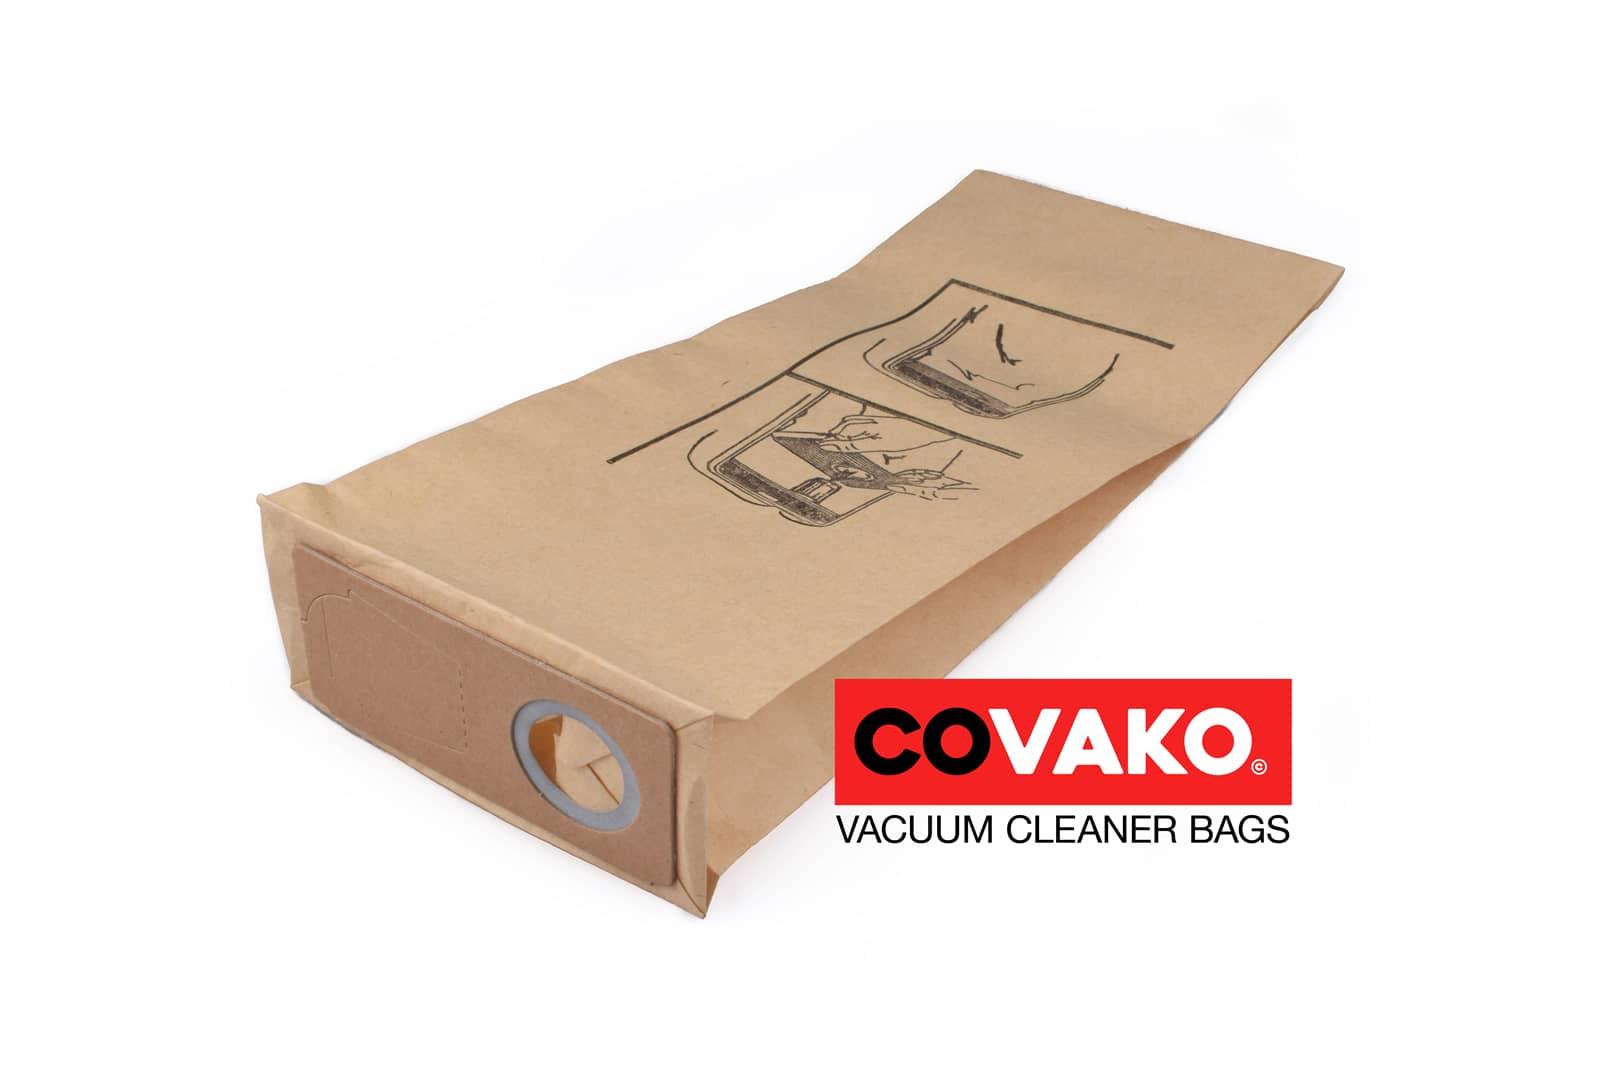 Wap GU 350 A / Papier - Wap stofzuigerzakken